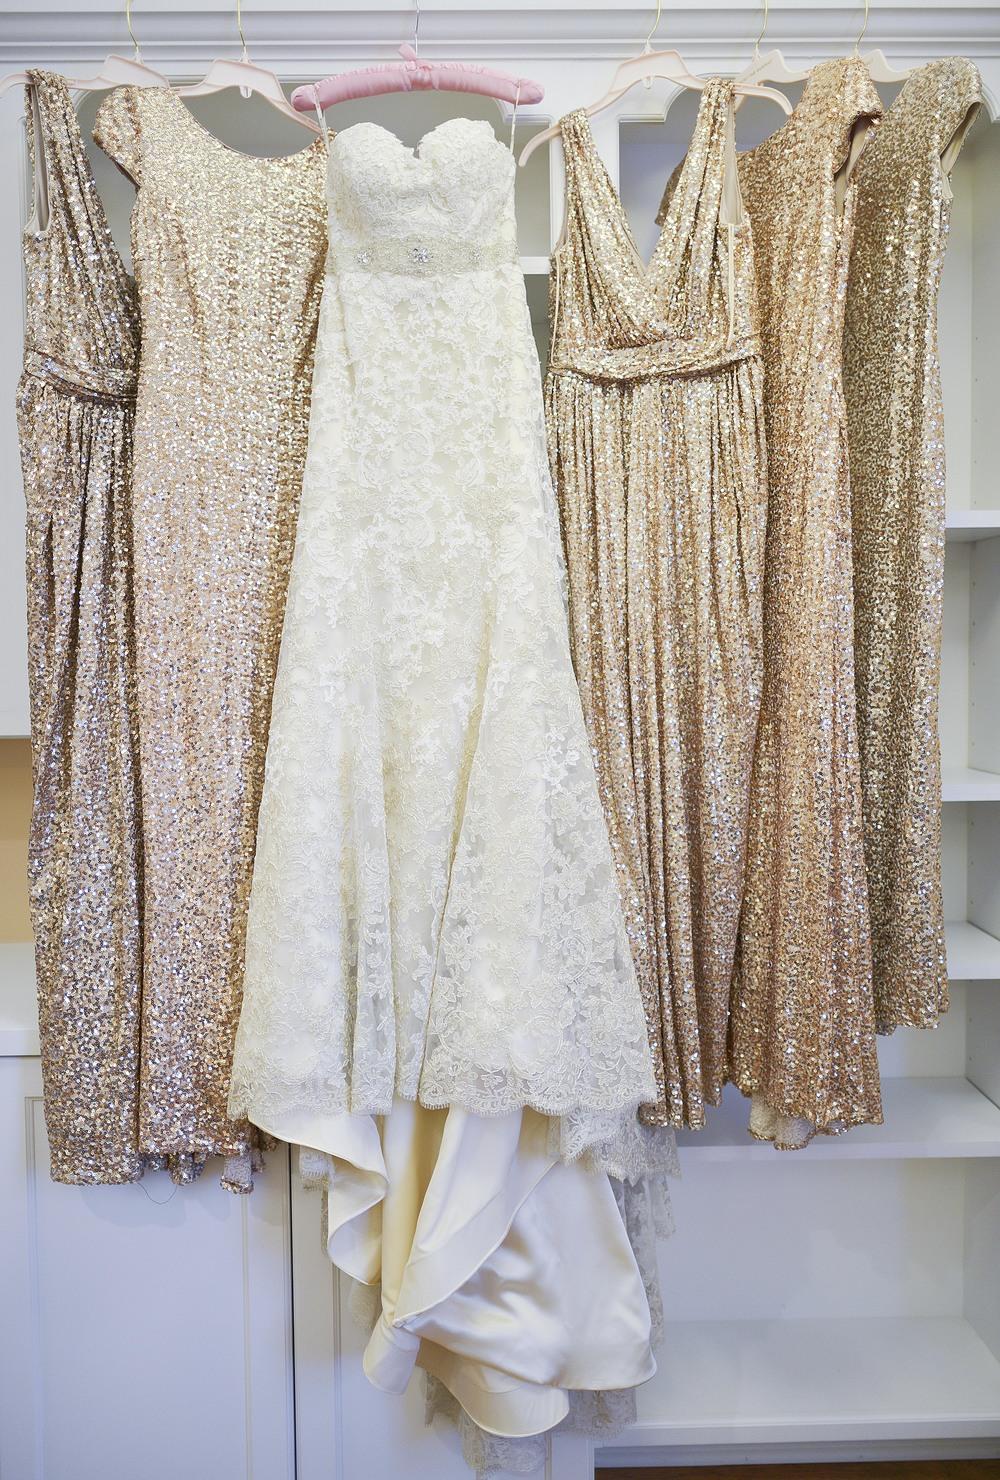 Those bridesmaids dresses... be still my heart.